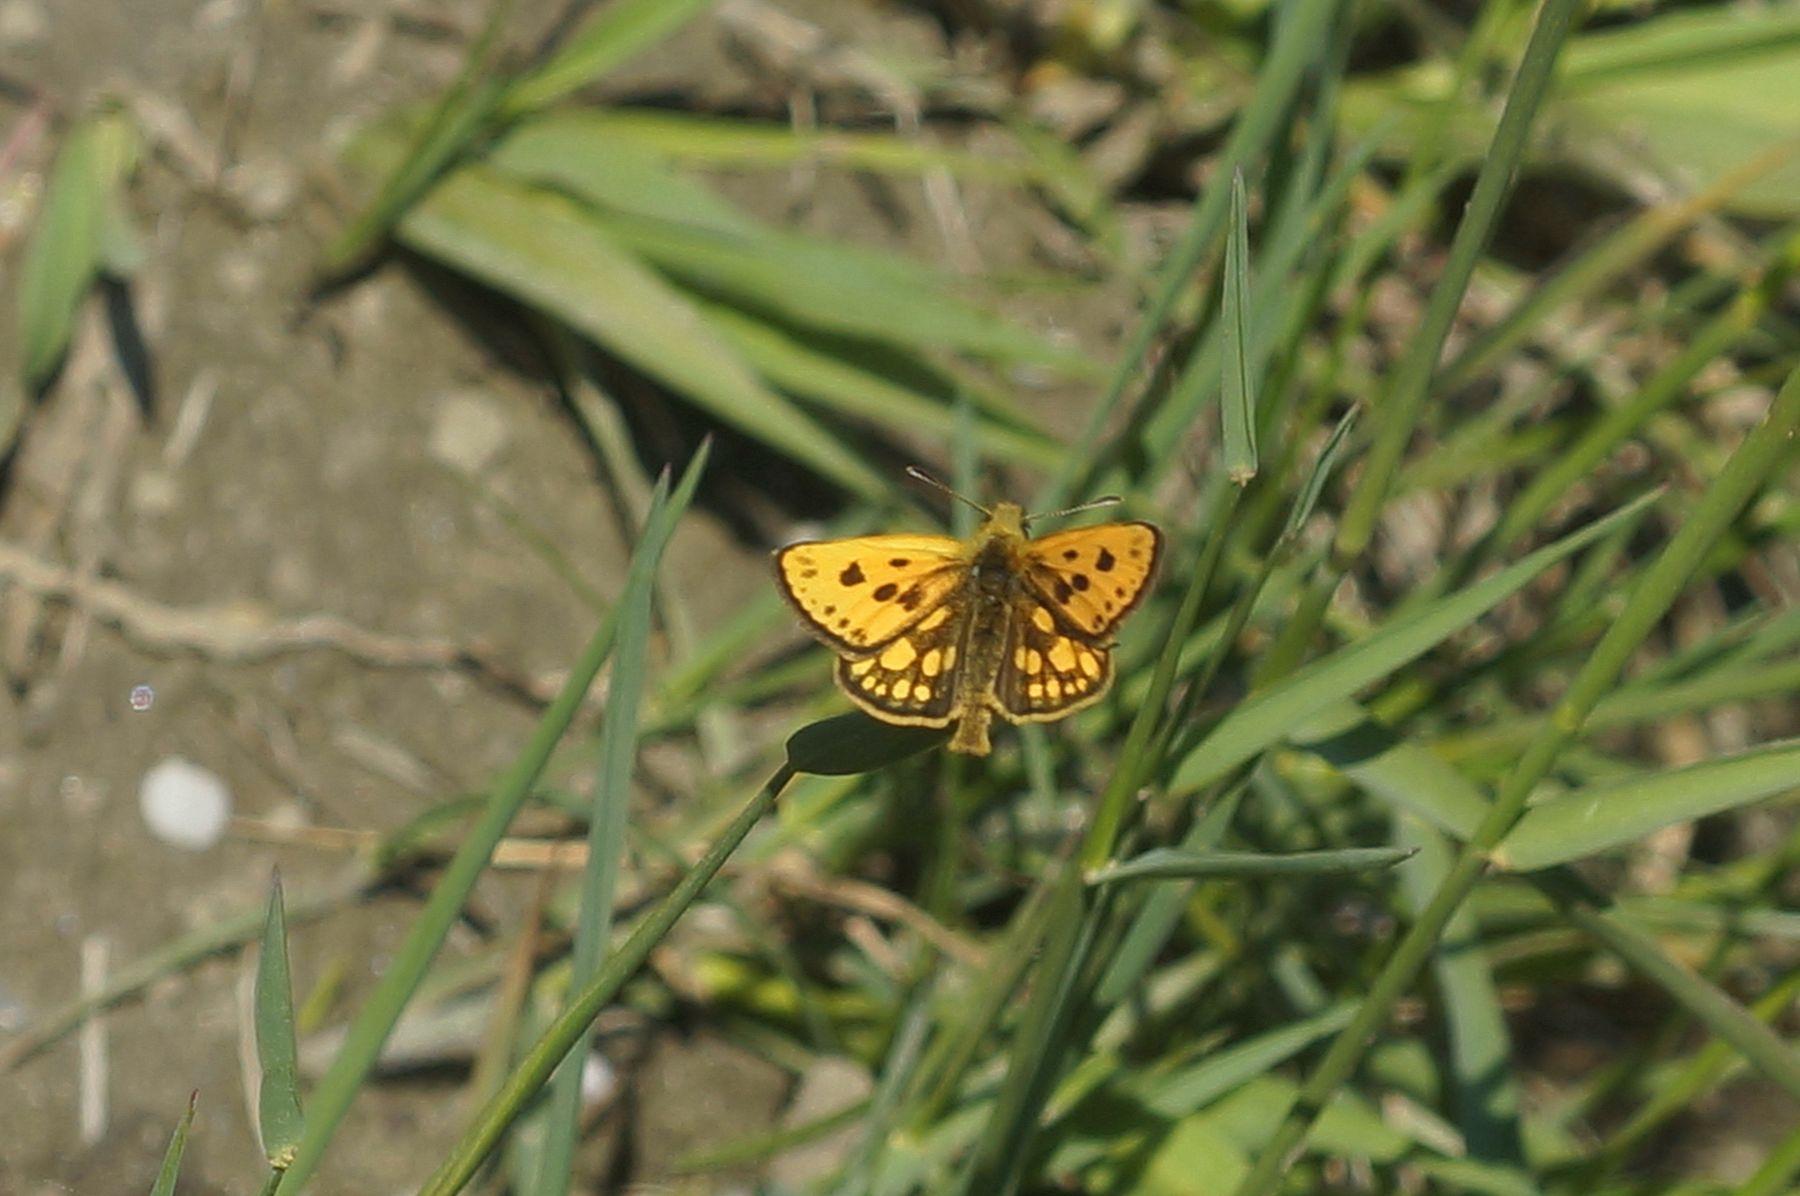 Толстоголовка толстоголовка бабочка лес лето трава